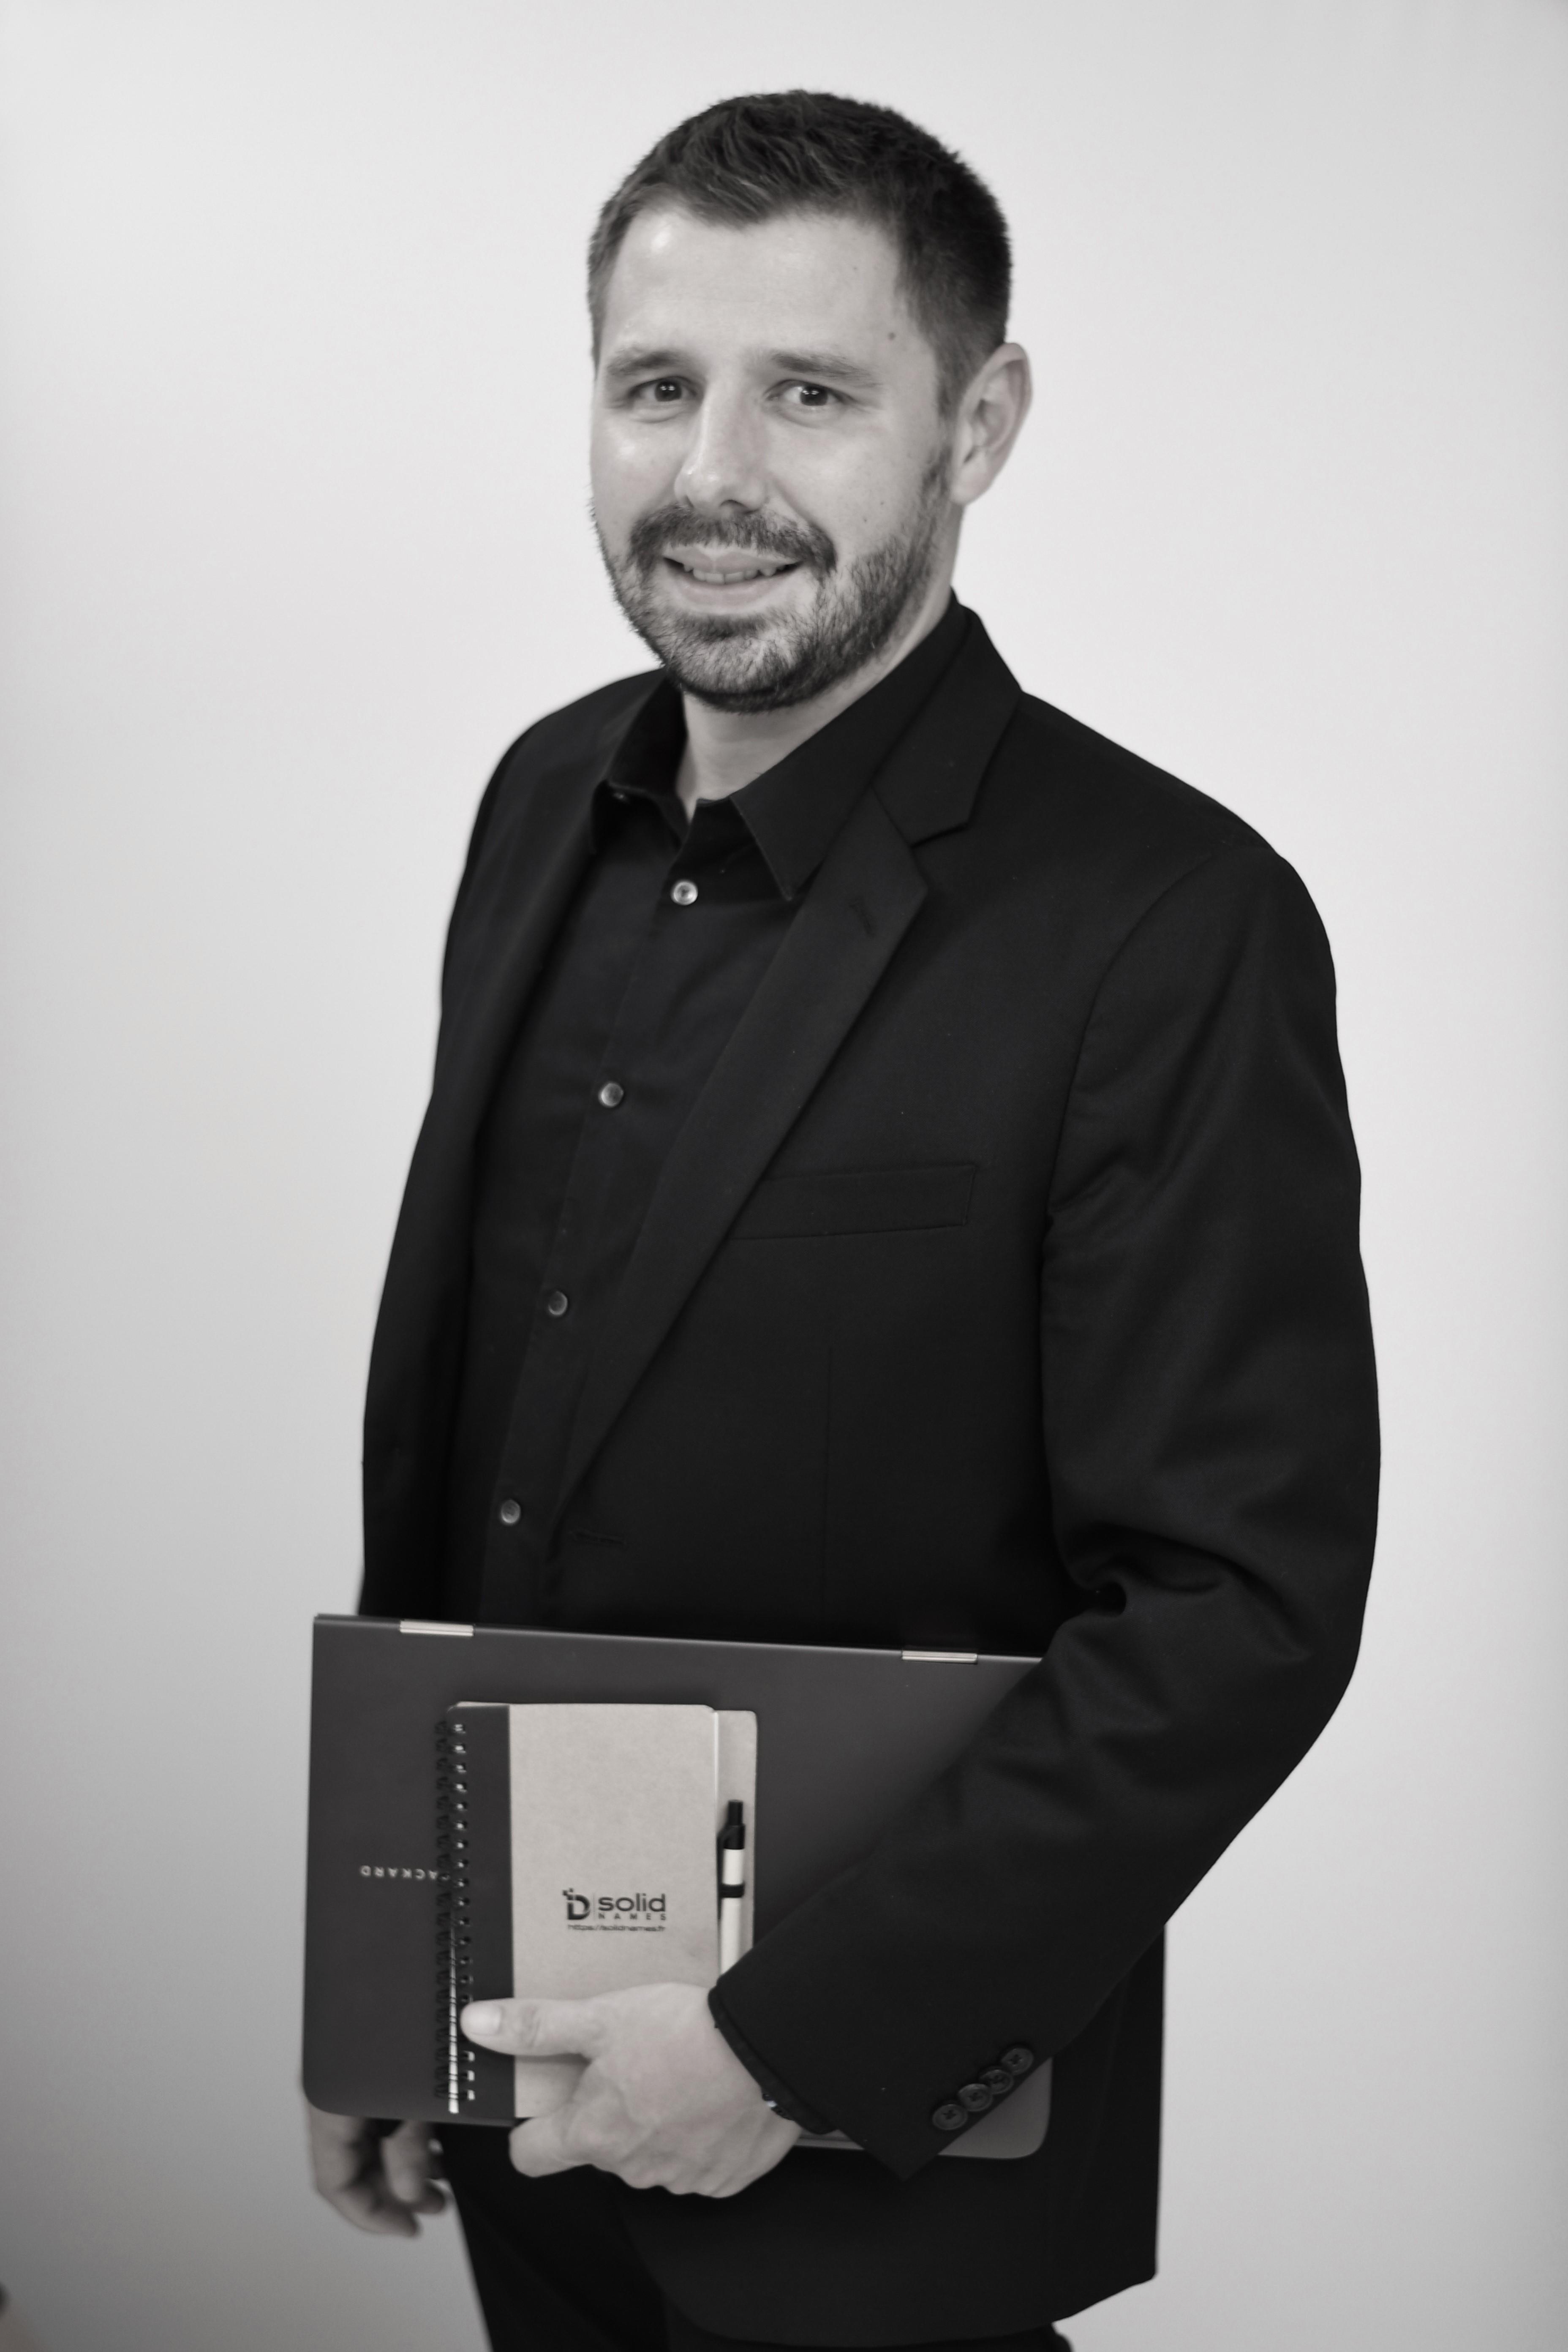 Jean-François POUSSARD